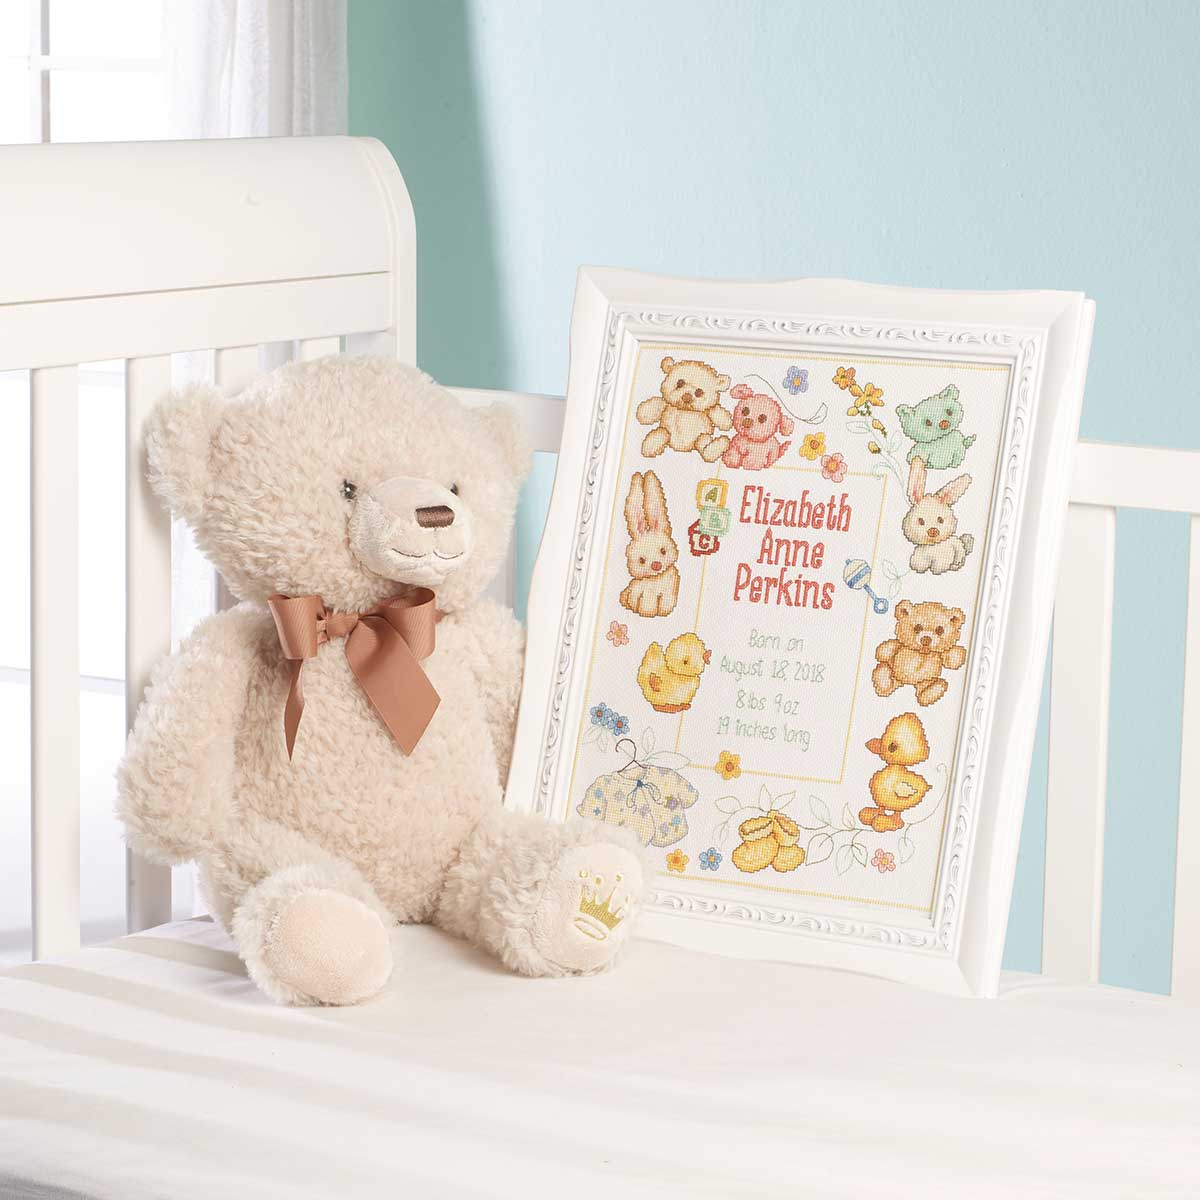 Bucilla ® Baby - Counted Cross Stitch - Crib Ensembles - Hallmark - Playful Pals - Birth Record Kit